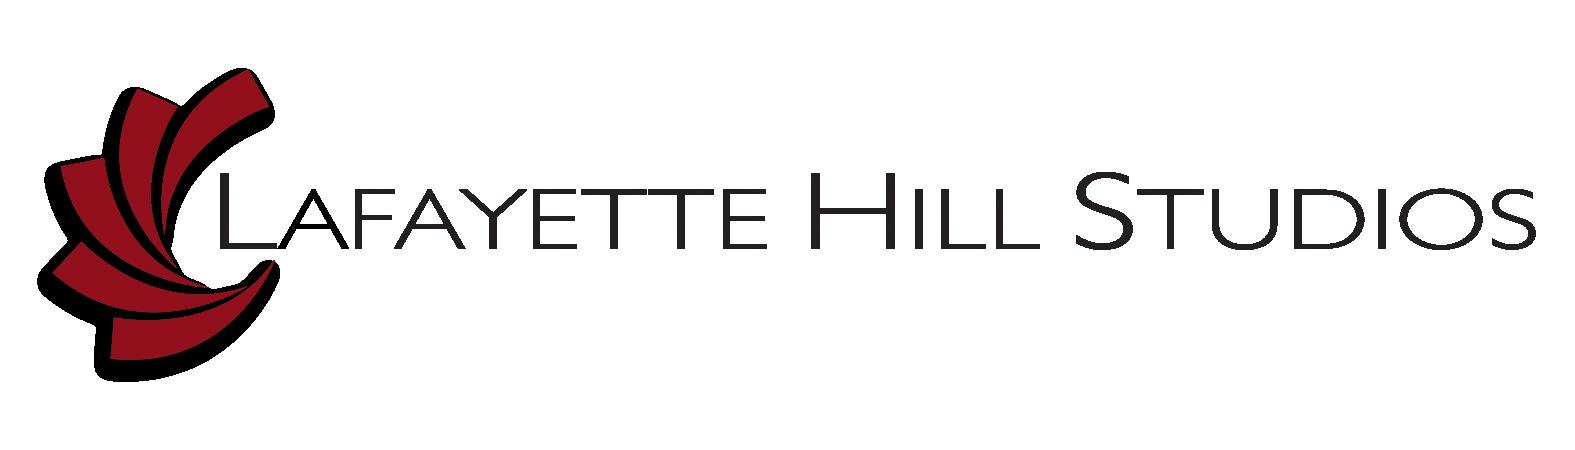 Lafayette Hill Studios